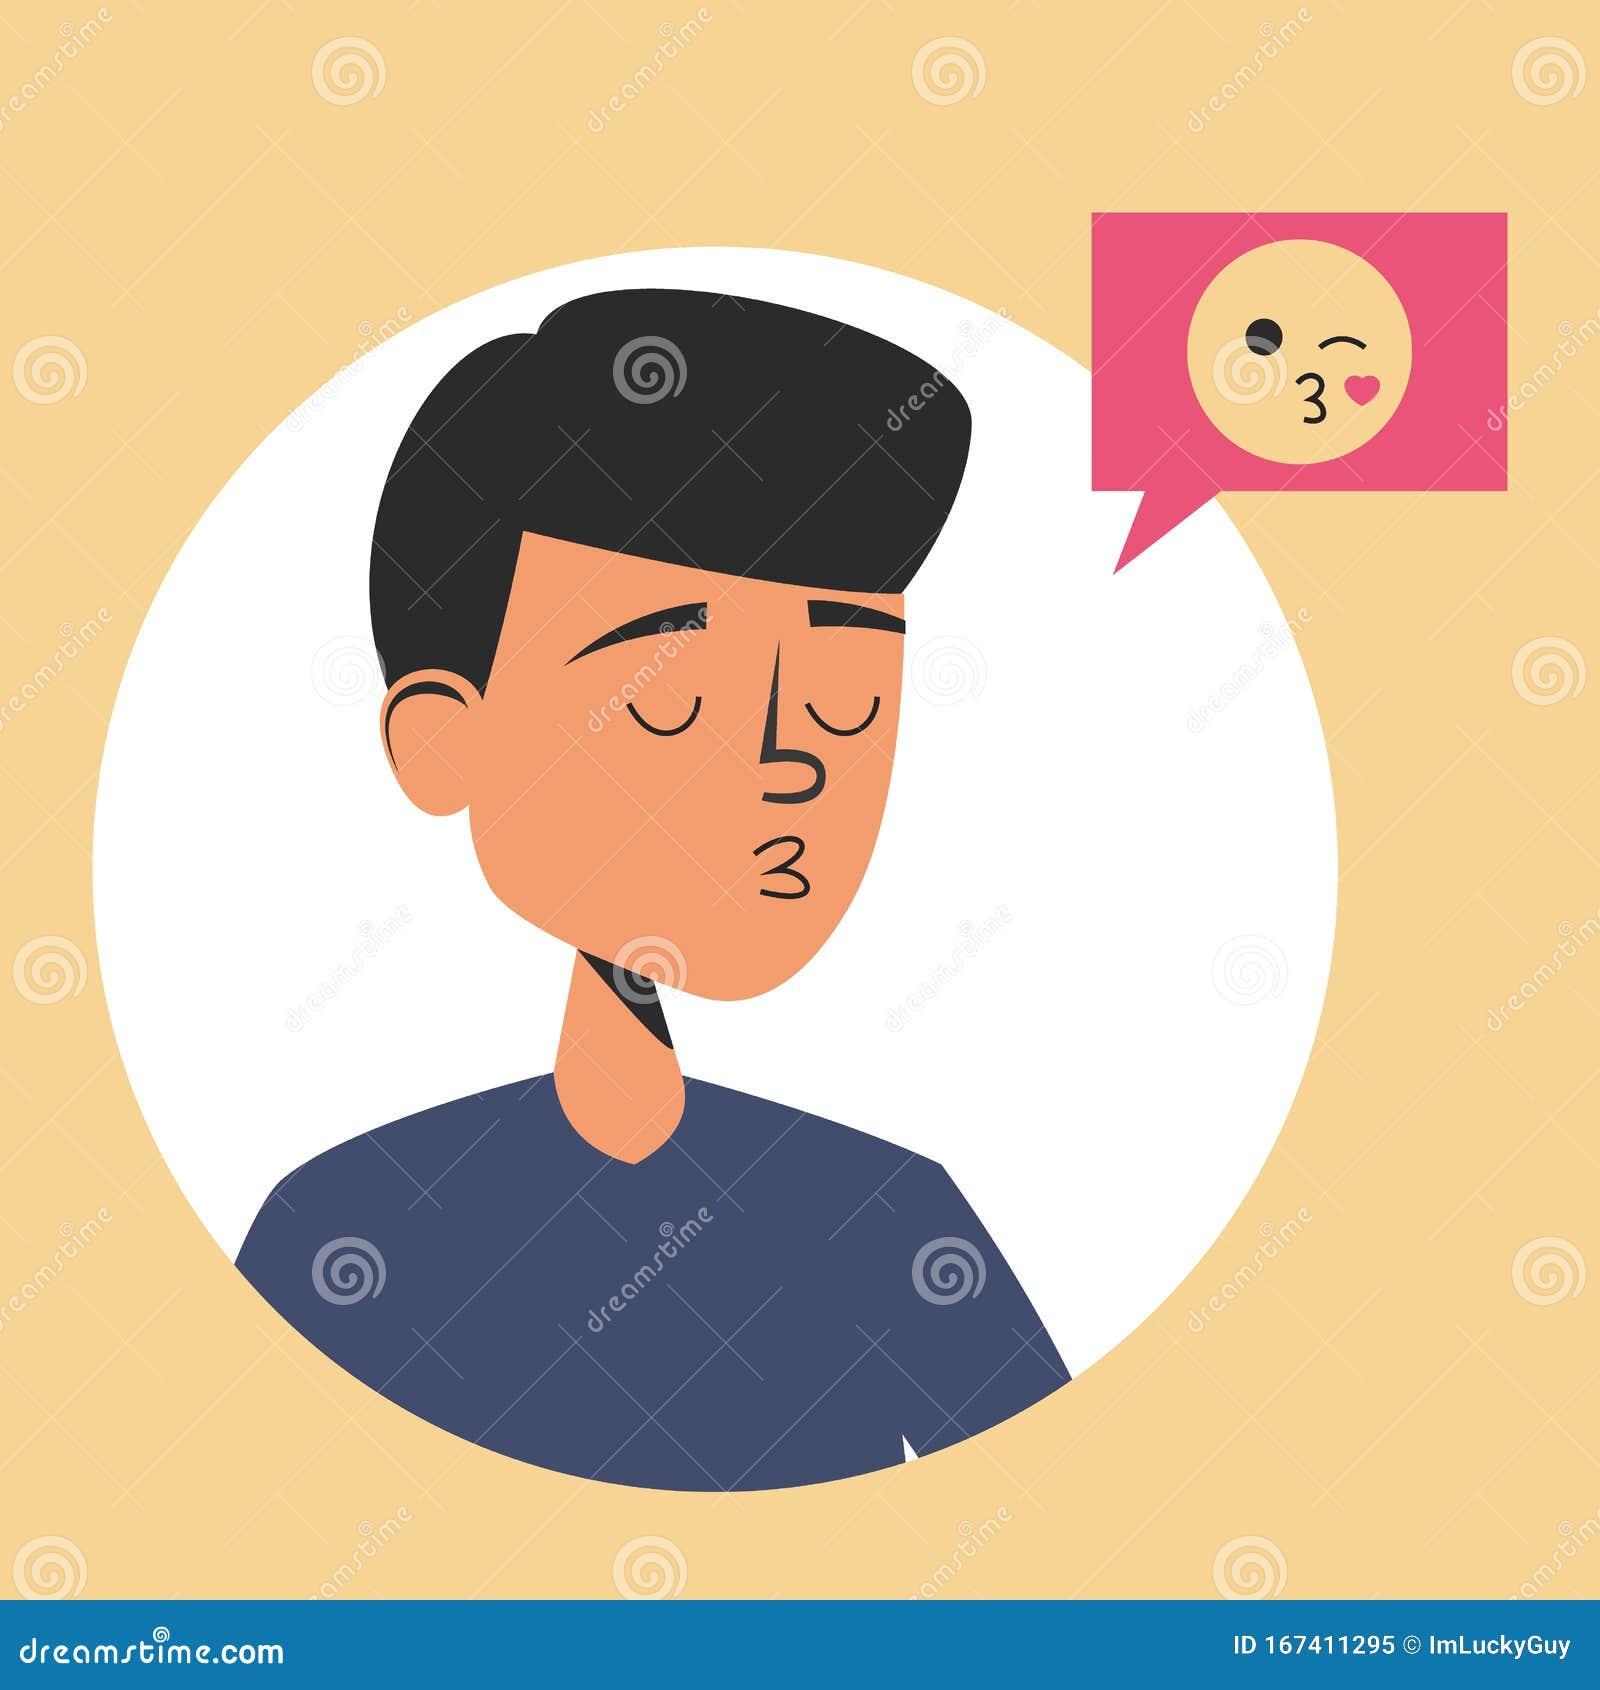 Guy a a when heart emoji sends Emojis Guys